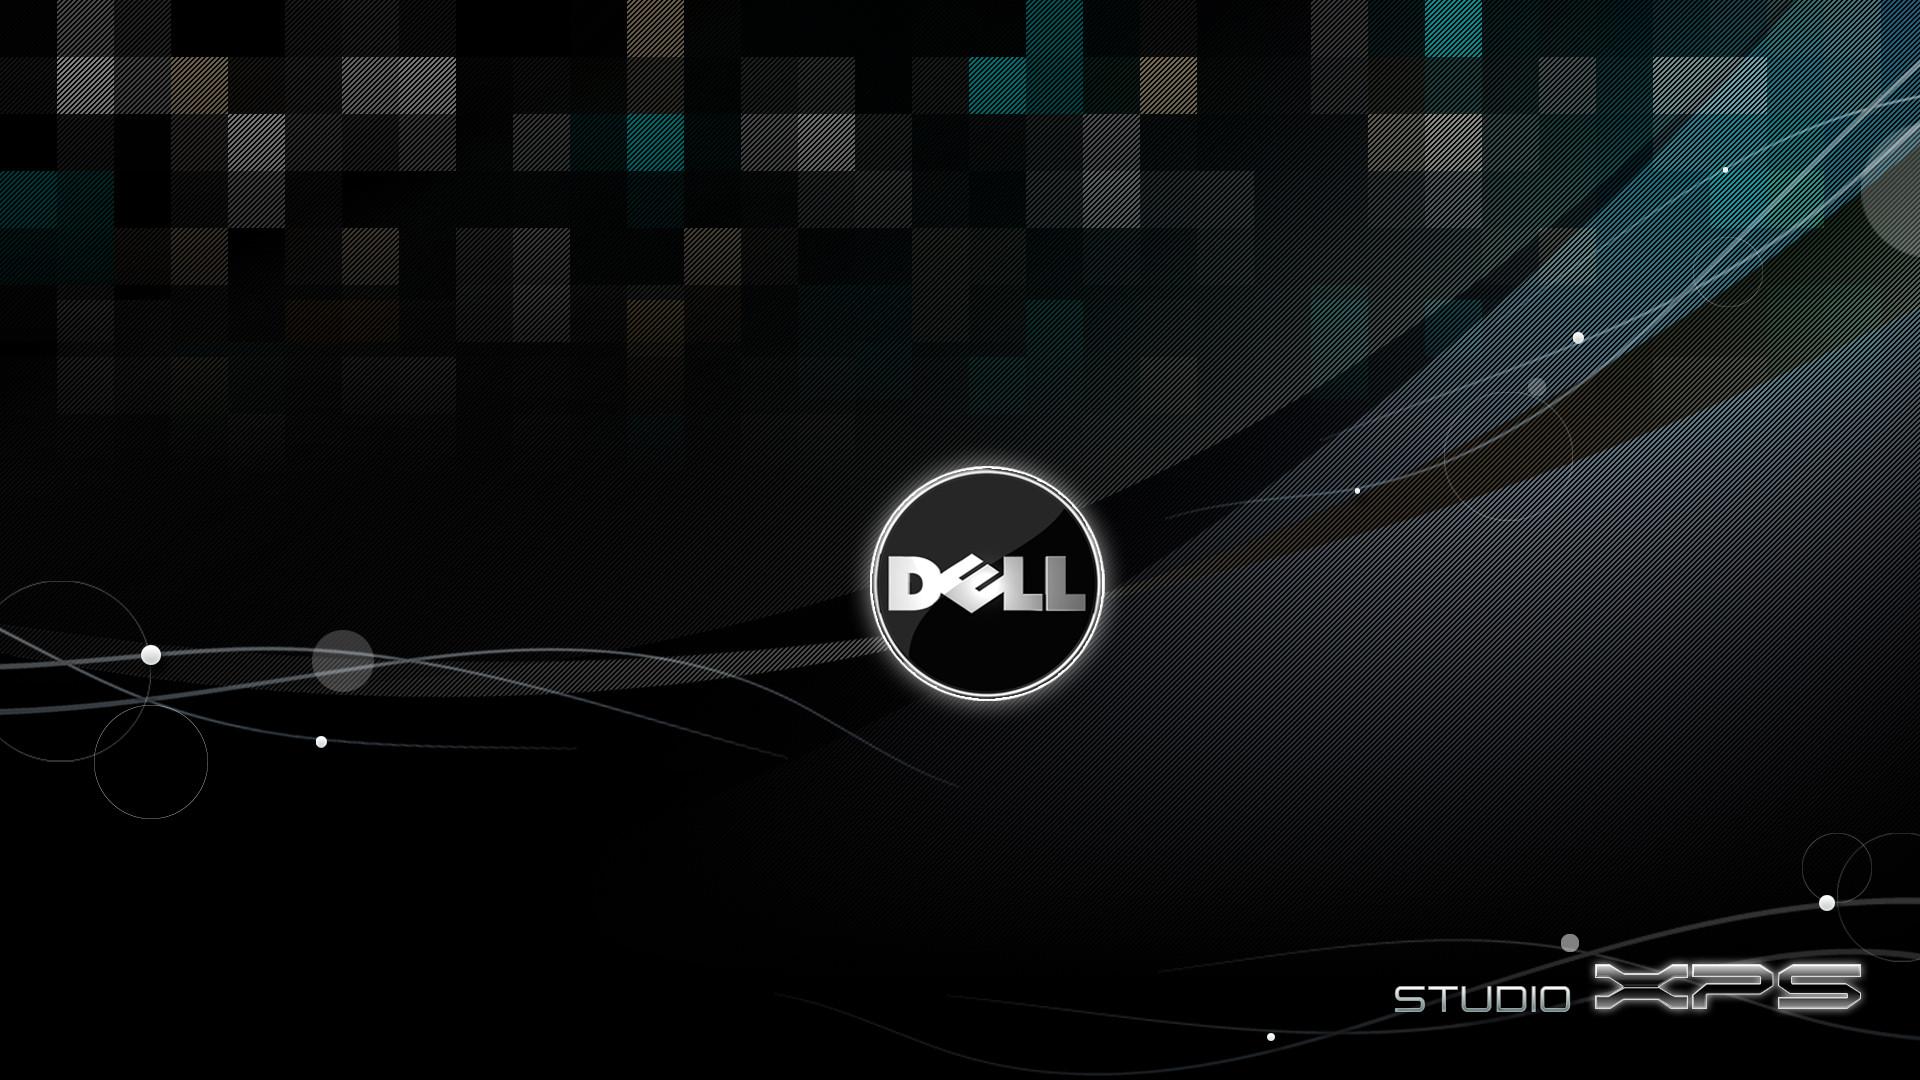 Dell Studio Wallpapers Dell Wallpaper Black